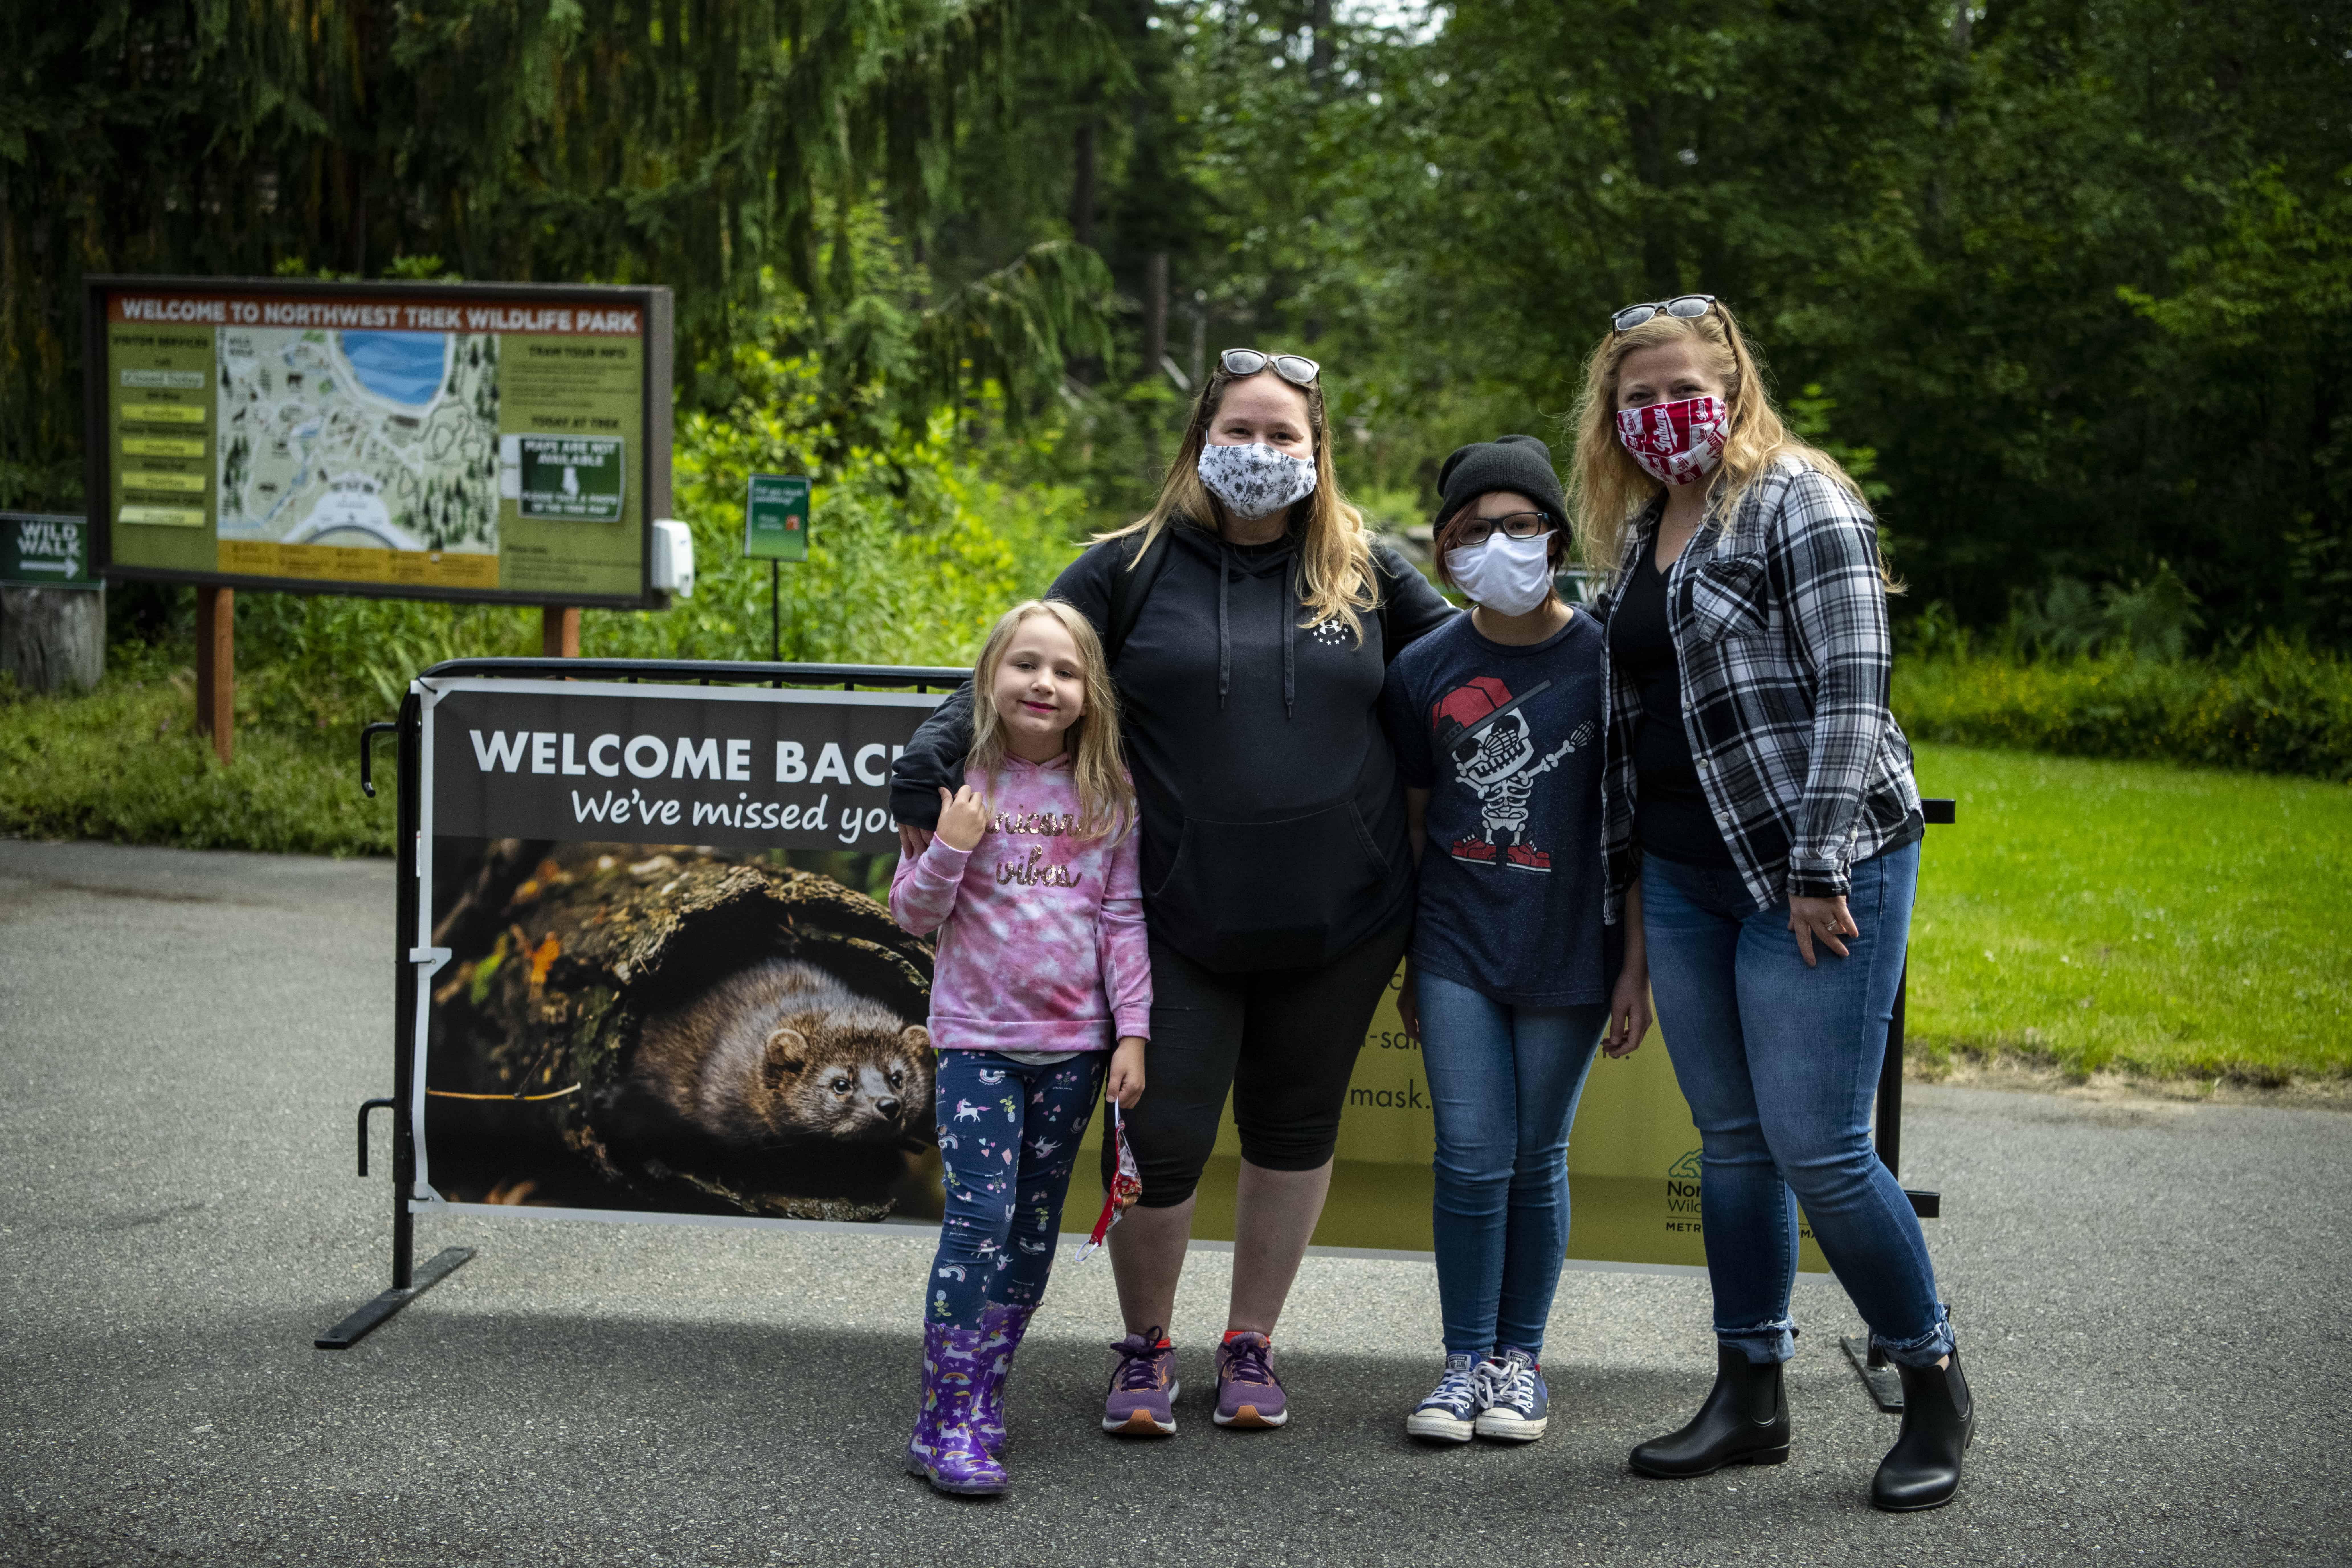 Members enjoy Wild Walk at Northwest Trek Wildlife Park